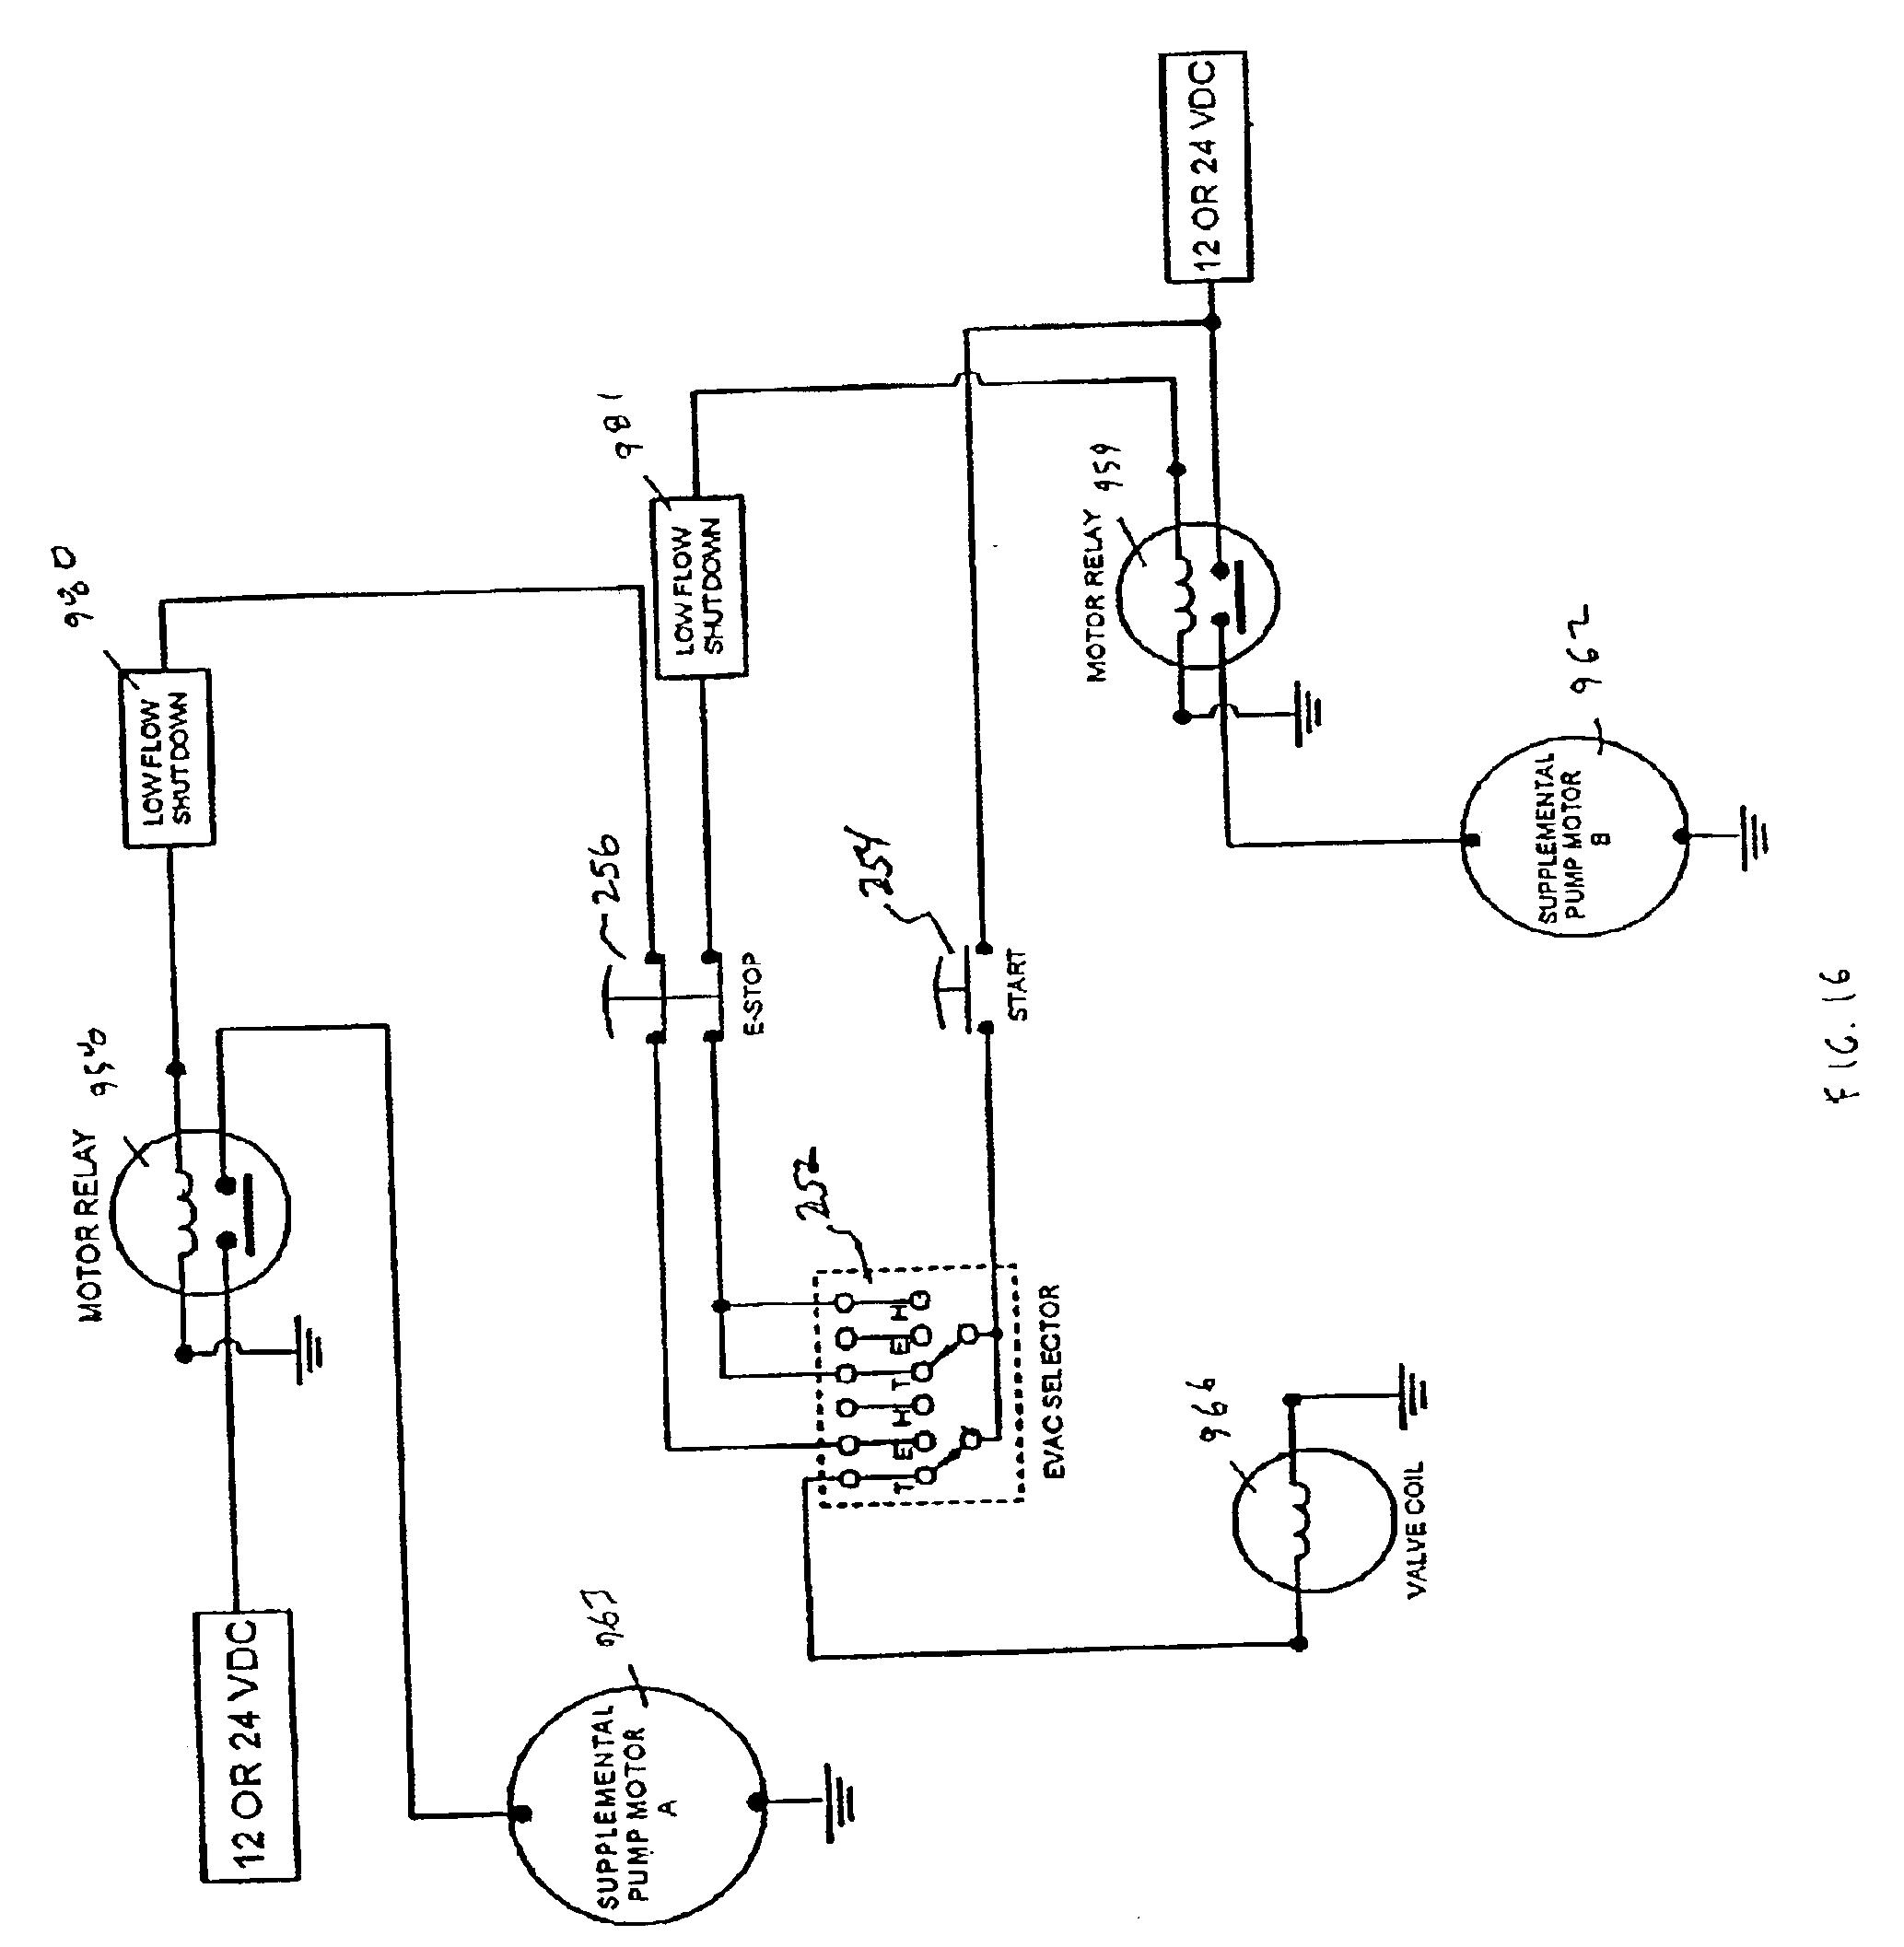 US06941969 20050913 D00013?resize\\\\\\\\\\\\\\\\\\\\\\\\\\\\\\\\\\\\\\\\\\\\\\\\\\\\\\\=665%2C680 hyperlites wiring diagram wiring gfci outlets in series \u2022 wiring hyper lites wiring diagram at eliteediting.co